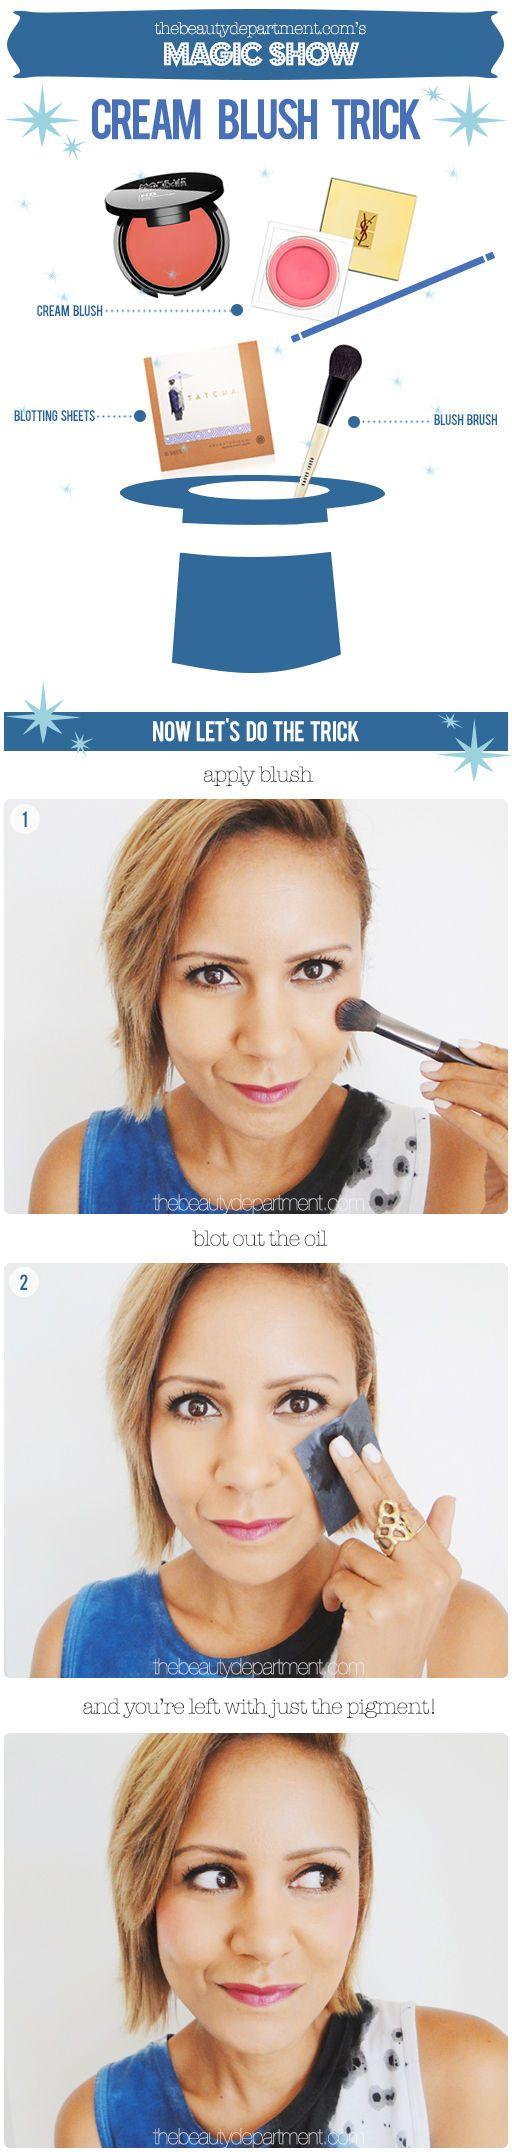 How to make cream blush last longer....